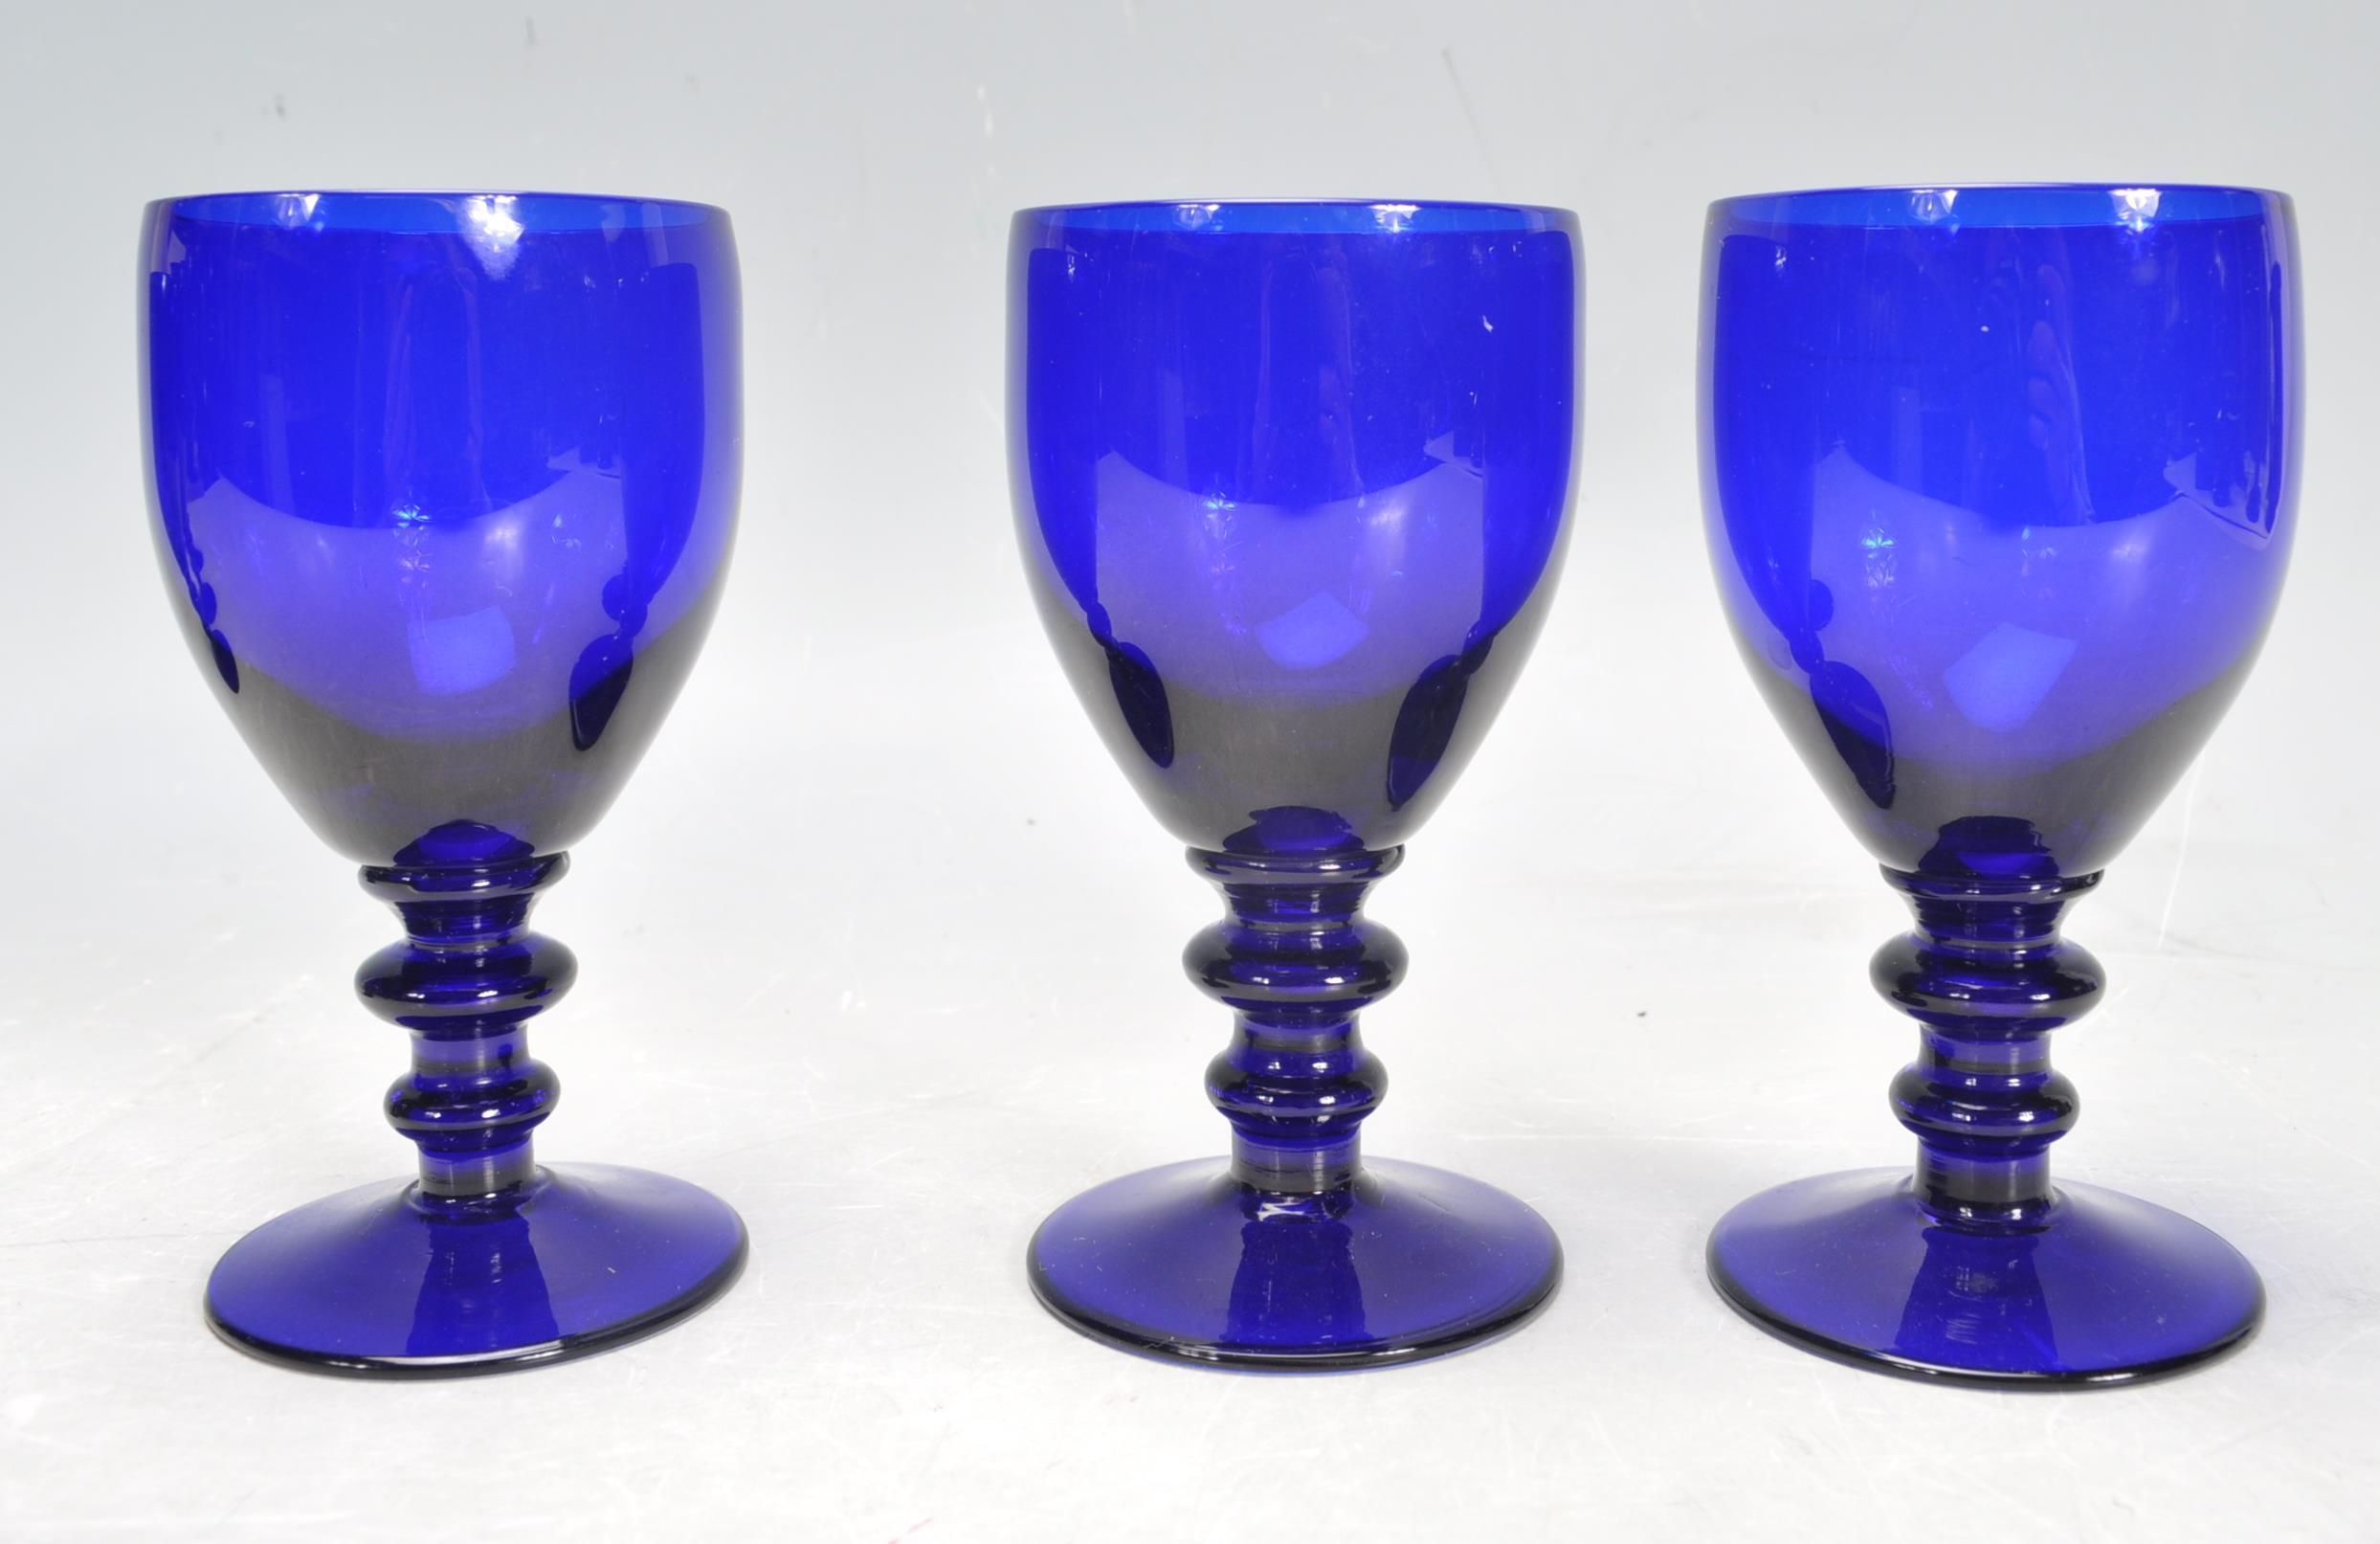 BRISTOL BLUE GLASS ORNAMENTS - Image 7 of 34